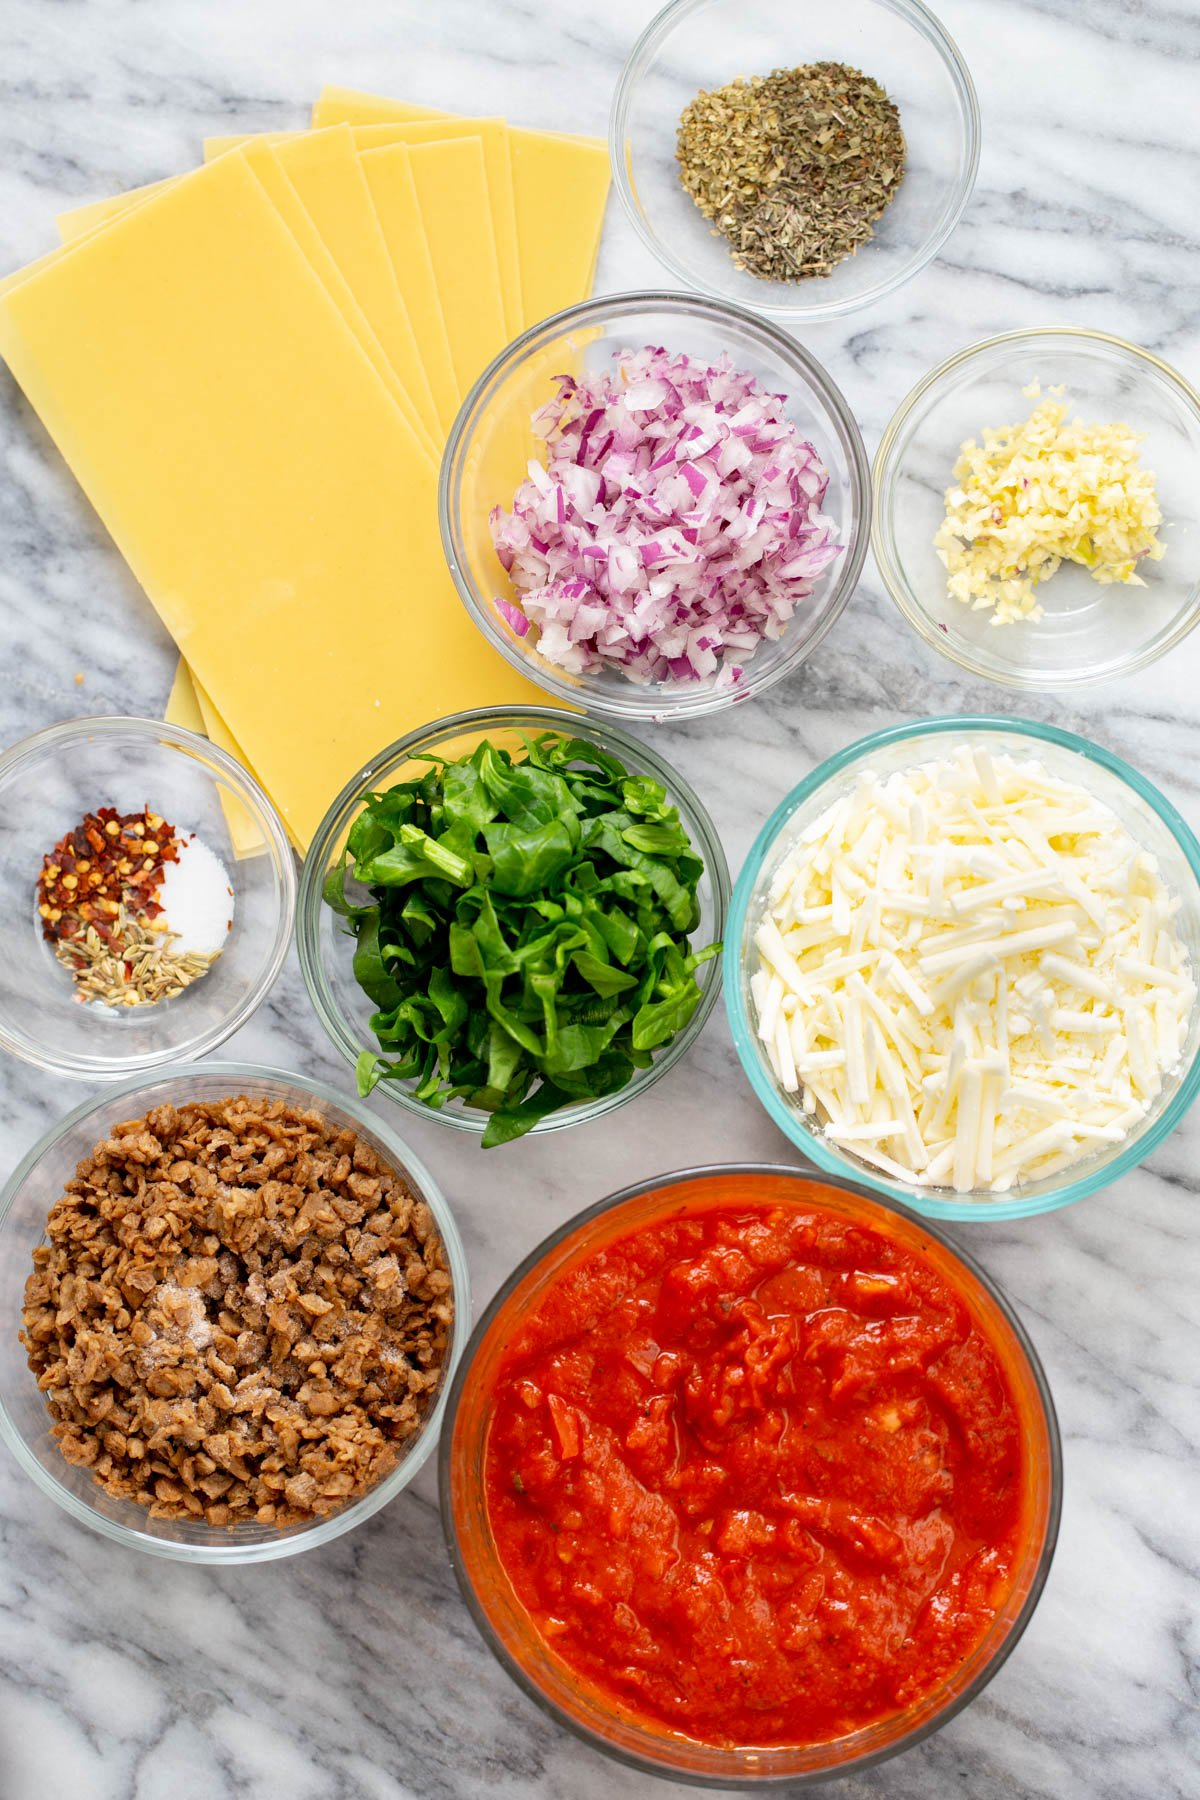 ingredients needed for making skillet lasagna